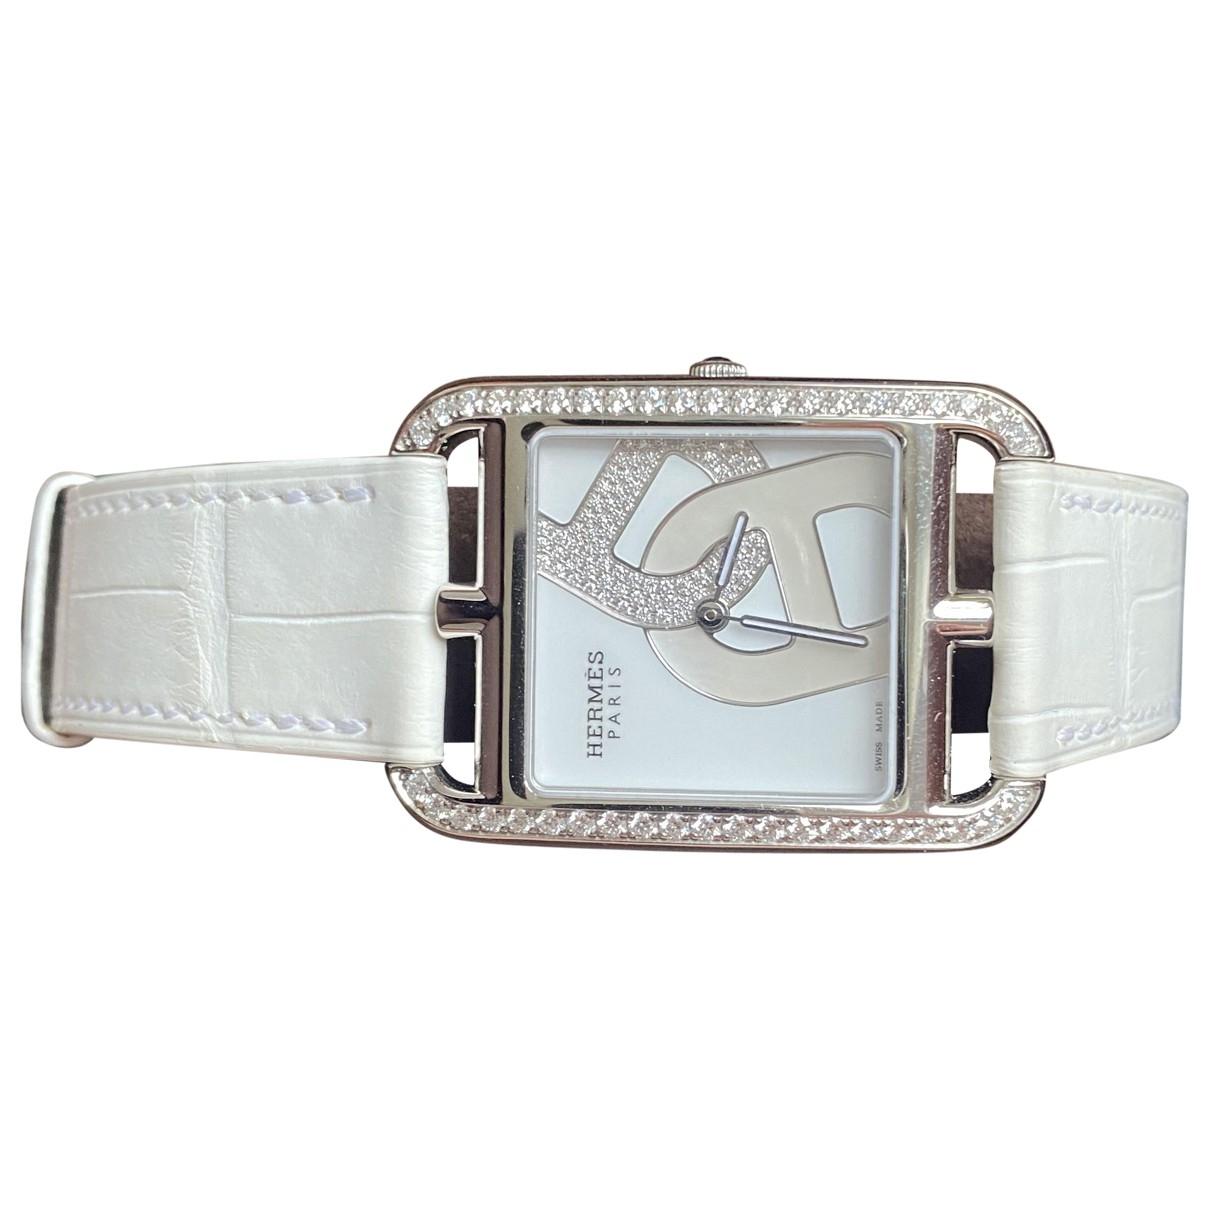 Hermes Cape Cod Diamants Uhr in  Weiss Stahl